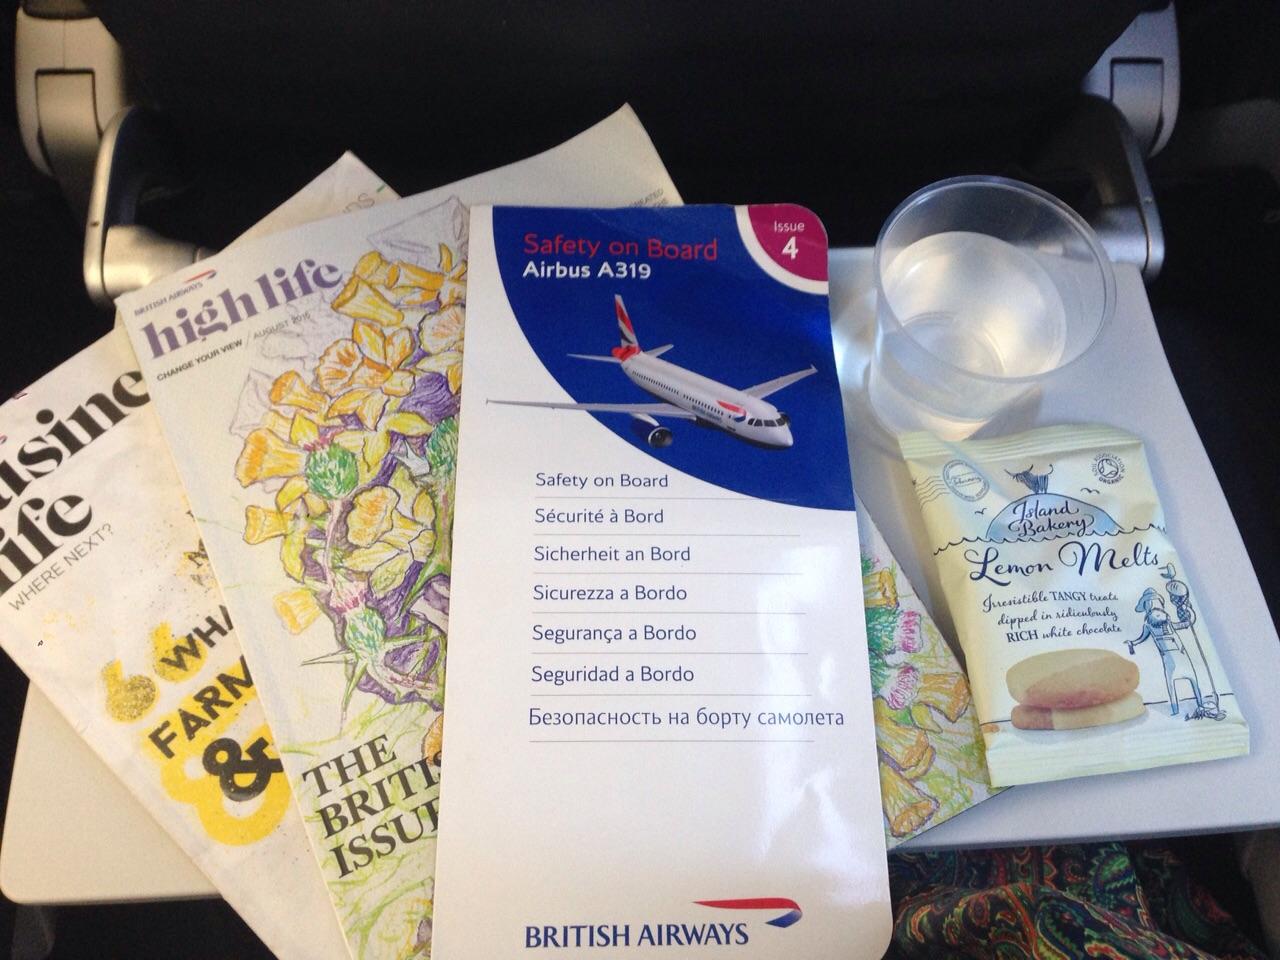 BA_British Airways_Inflight Food_snack_London_Dublin_Aug 2015_002